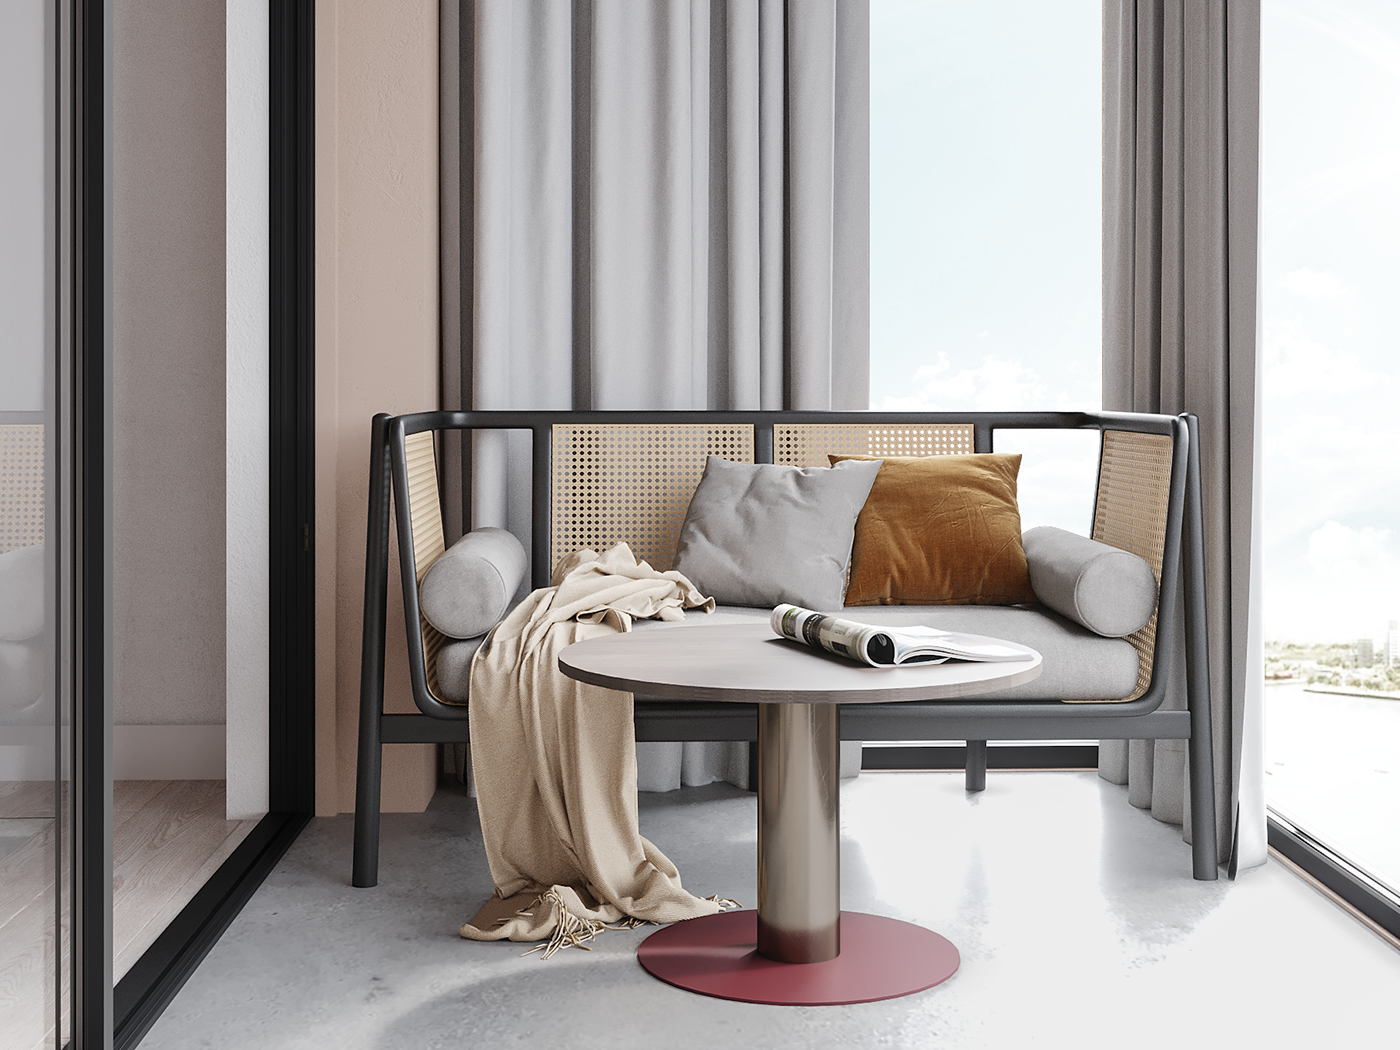 Apartment Singapore On Behance Contemporary Furniture Design Furniture Luxury Furniture